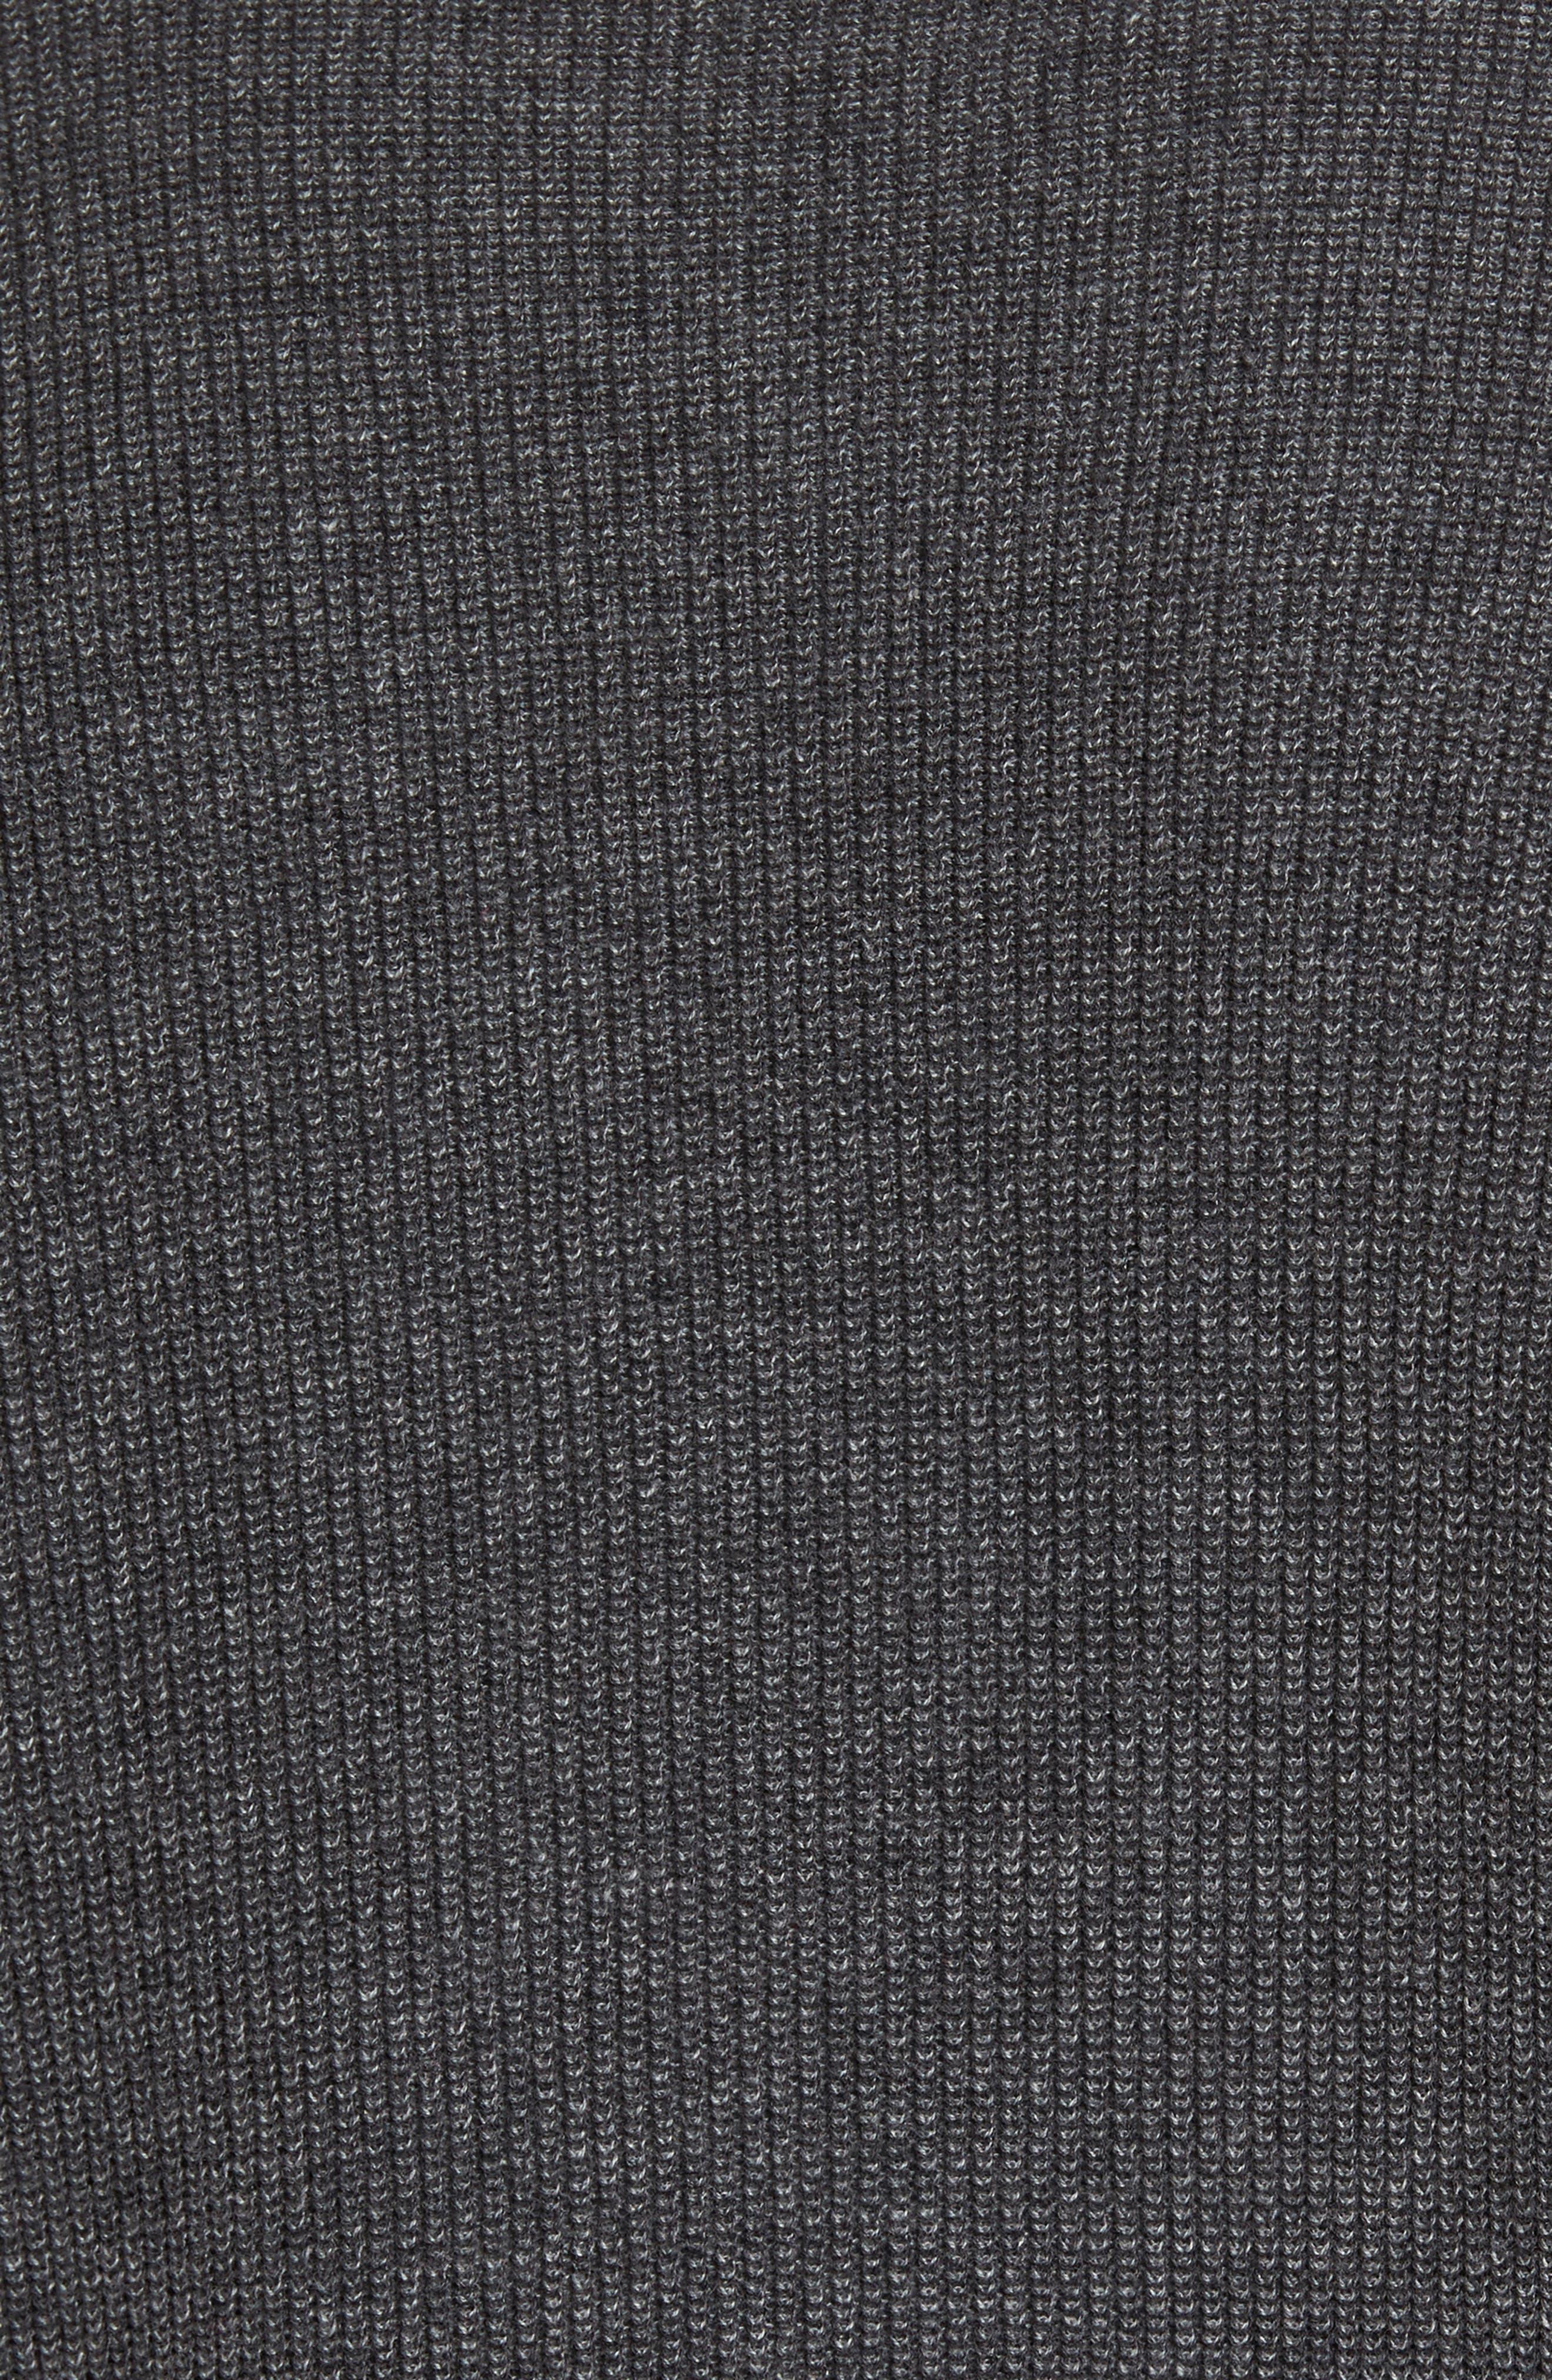 Supima<sup>®</sup> Cotton V-Neck Sweater,                             Alternate thumbnail 5, color,                             021